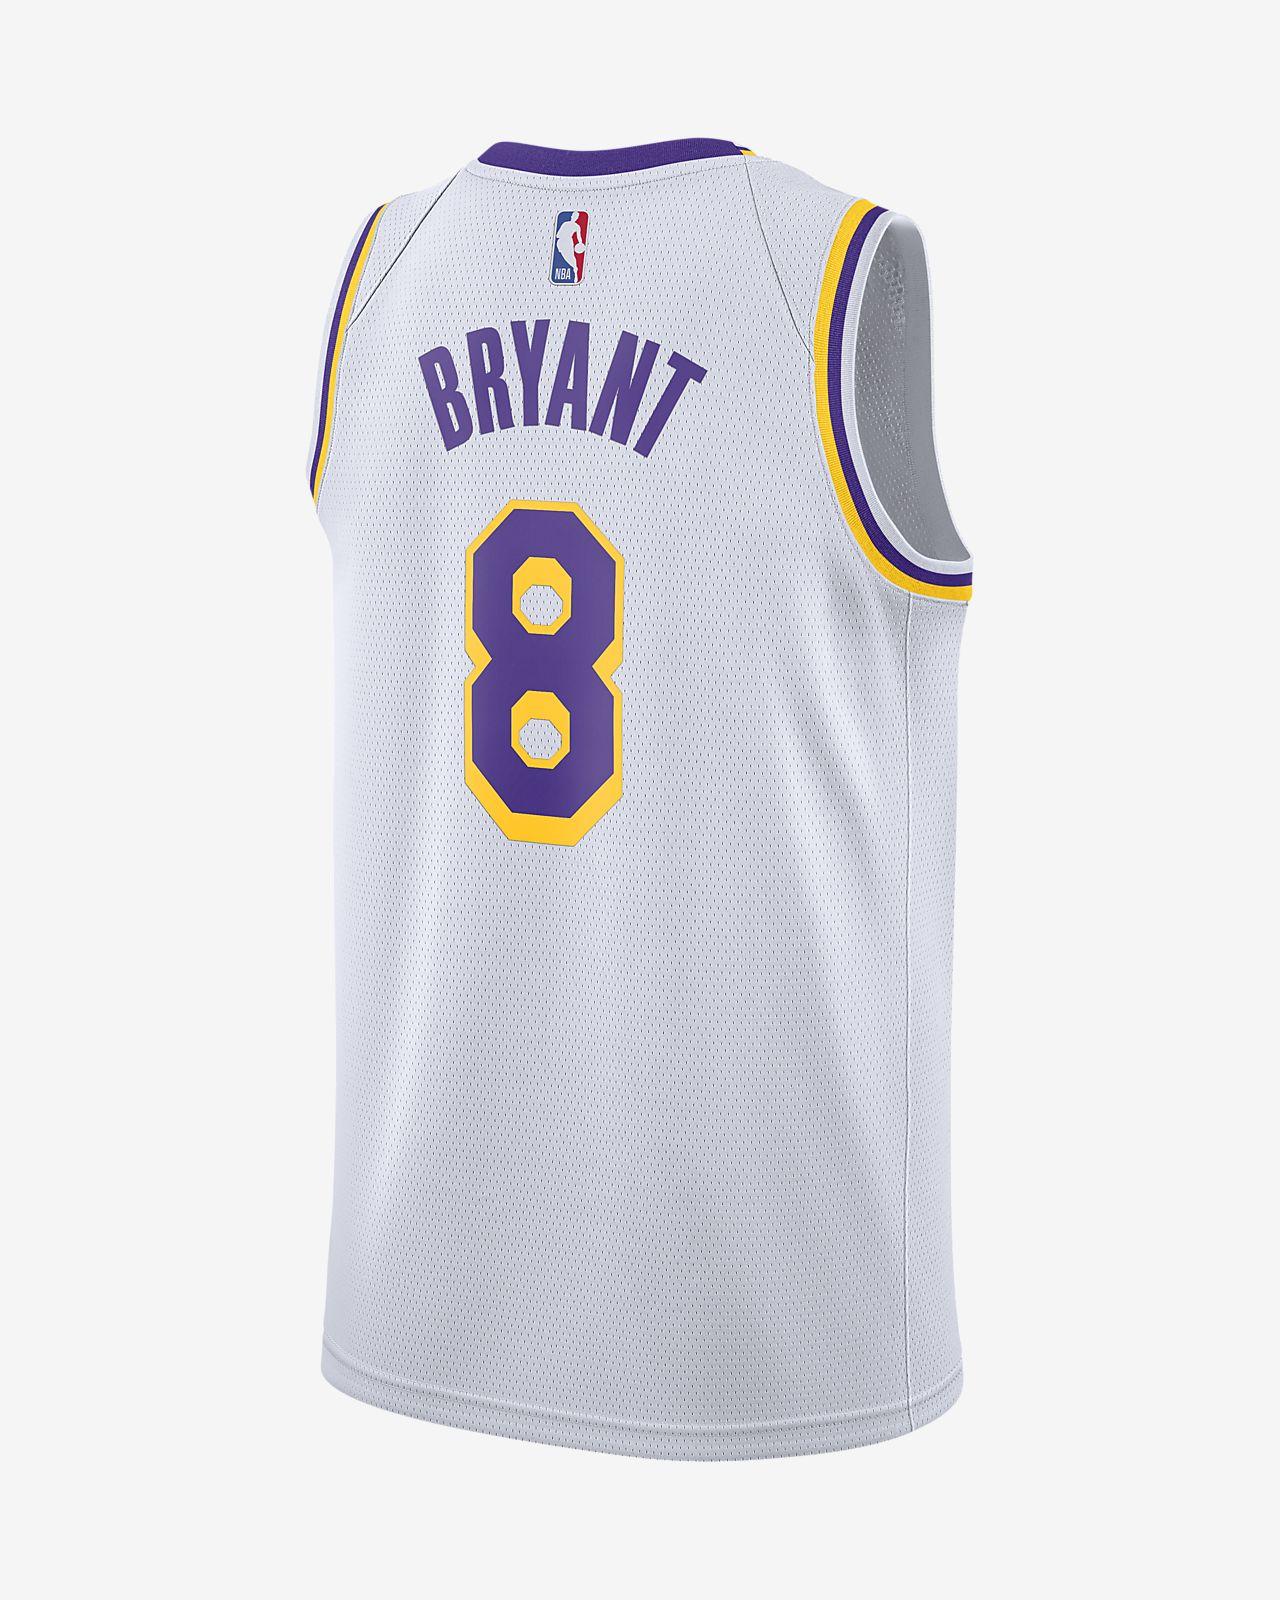 a9214e1ef25 ... Kobe Bryant Association Edition Swingman (Los Angeles Lakers) Men's  Nike NBA Connected Jersey